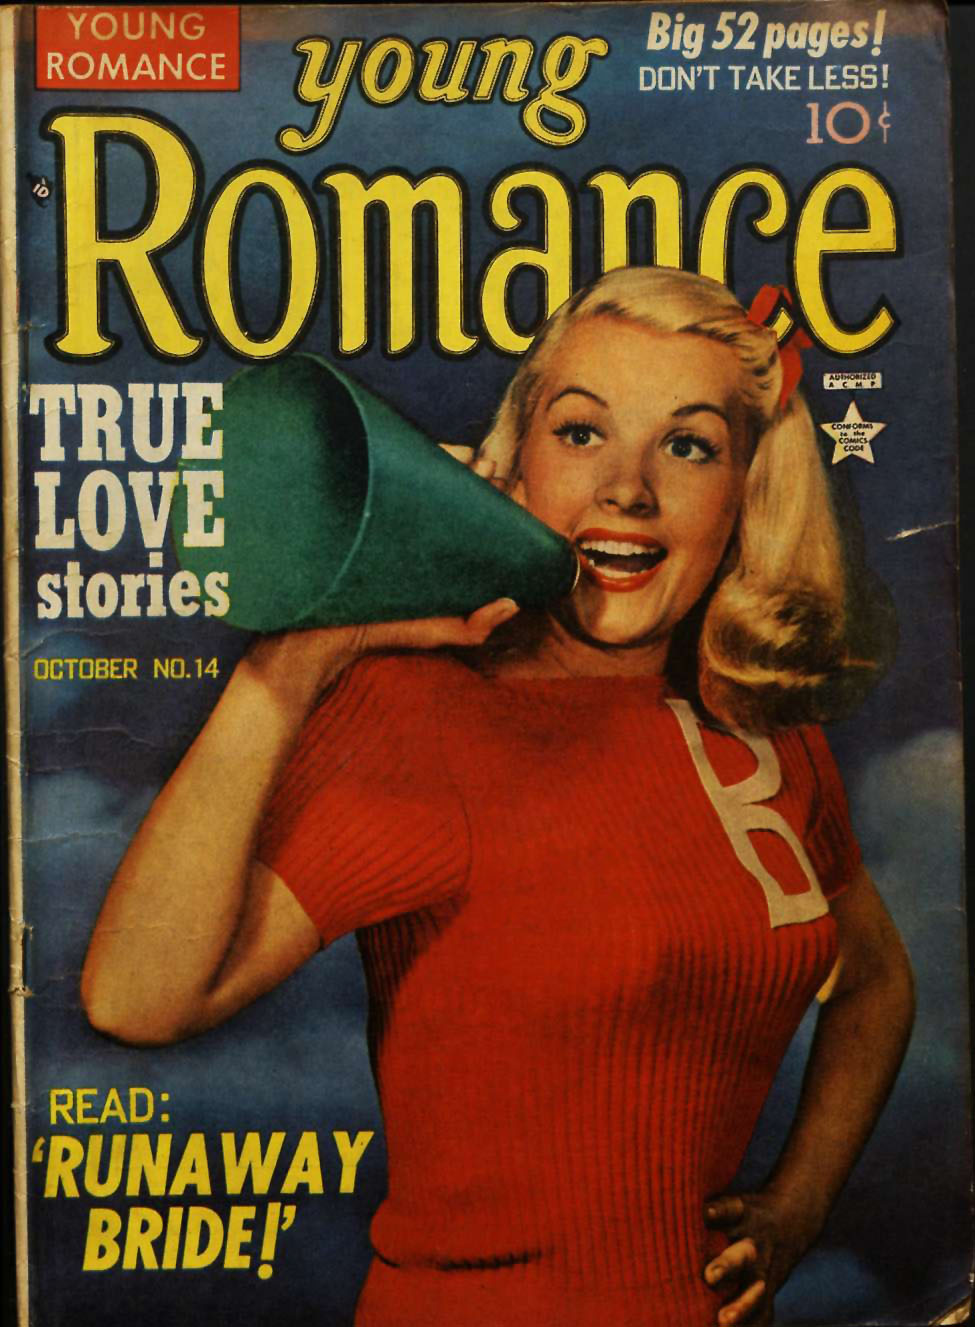 Young Romance v3 #2, Prize